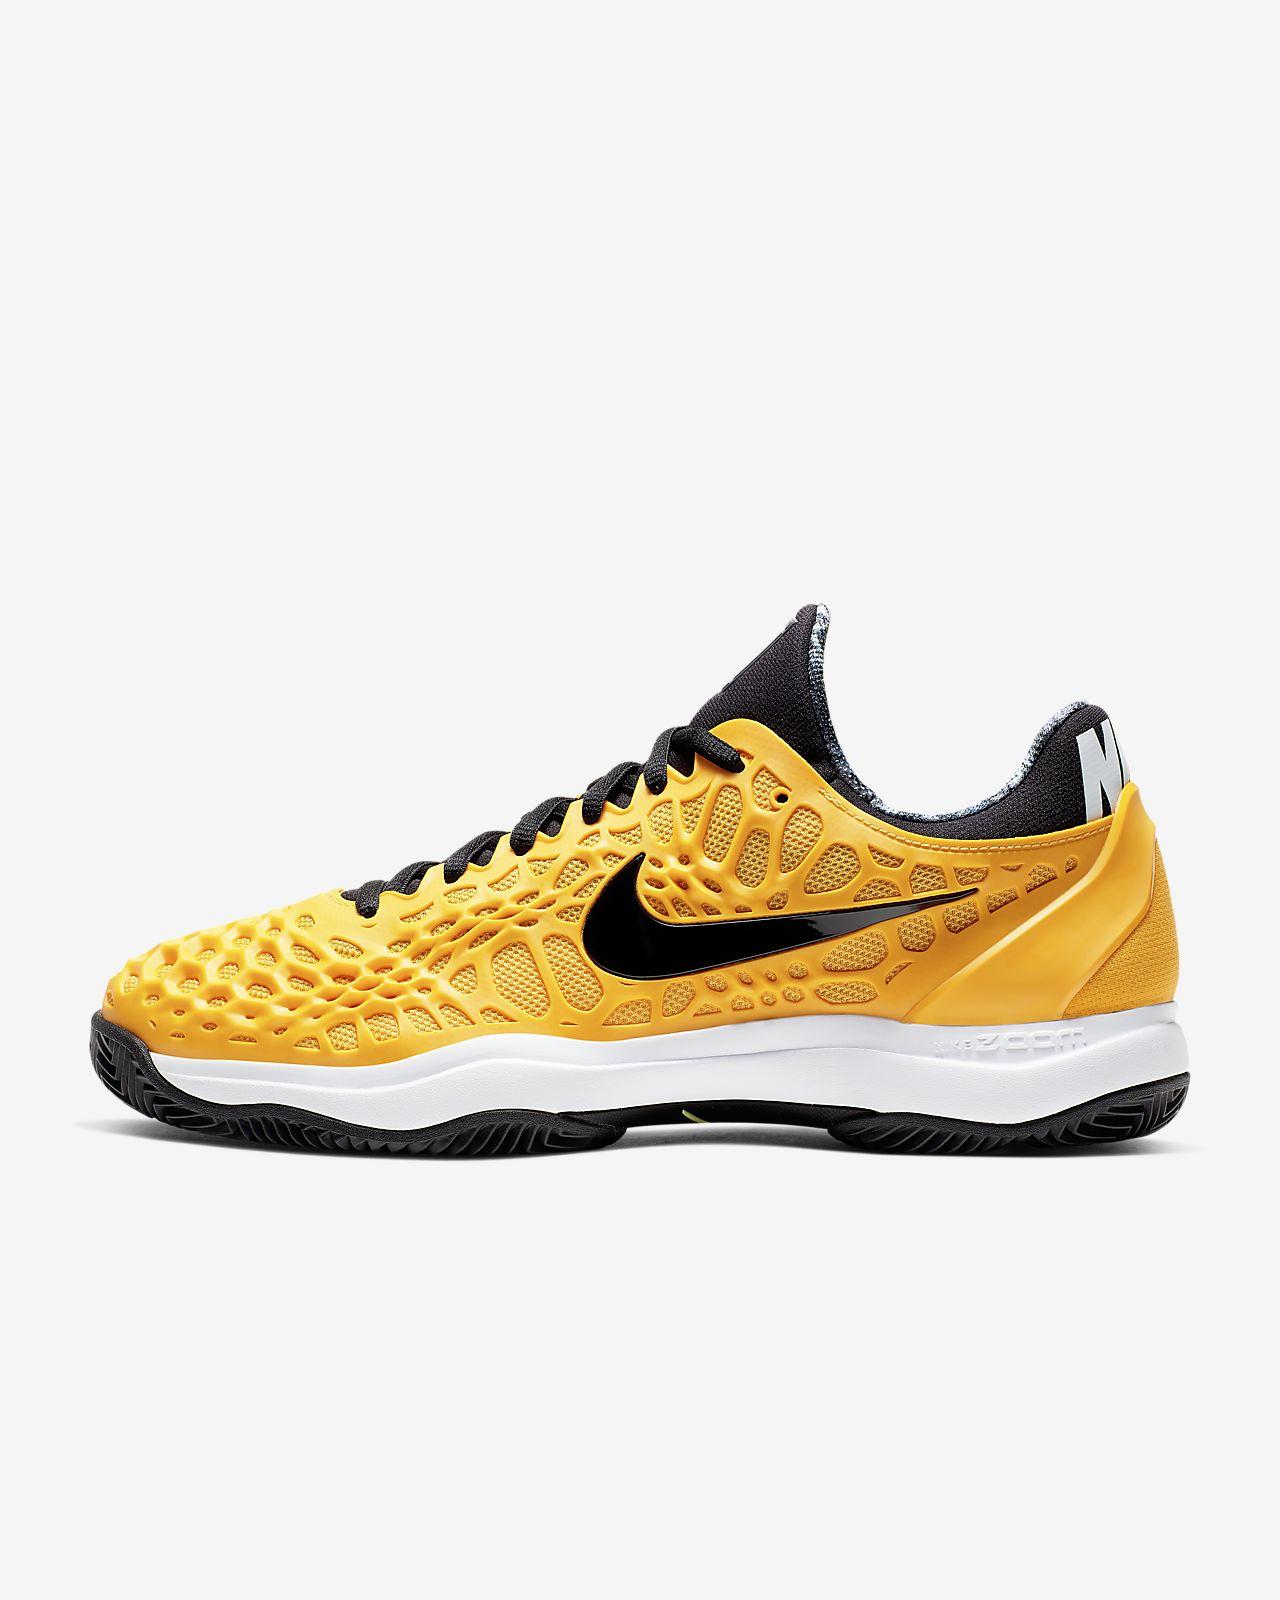 new style cf529 bd4cc Nike Zoom Cage 3 Clay Herren-Tennisschuh. Nike.com DE